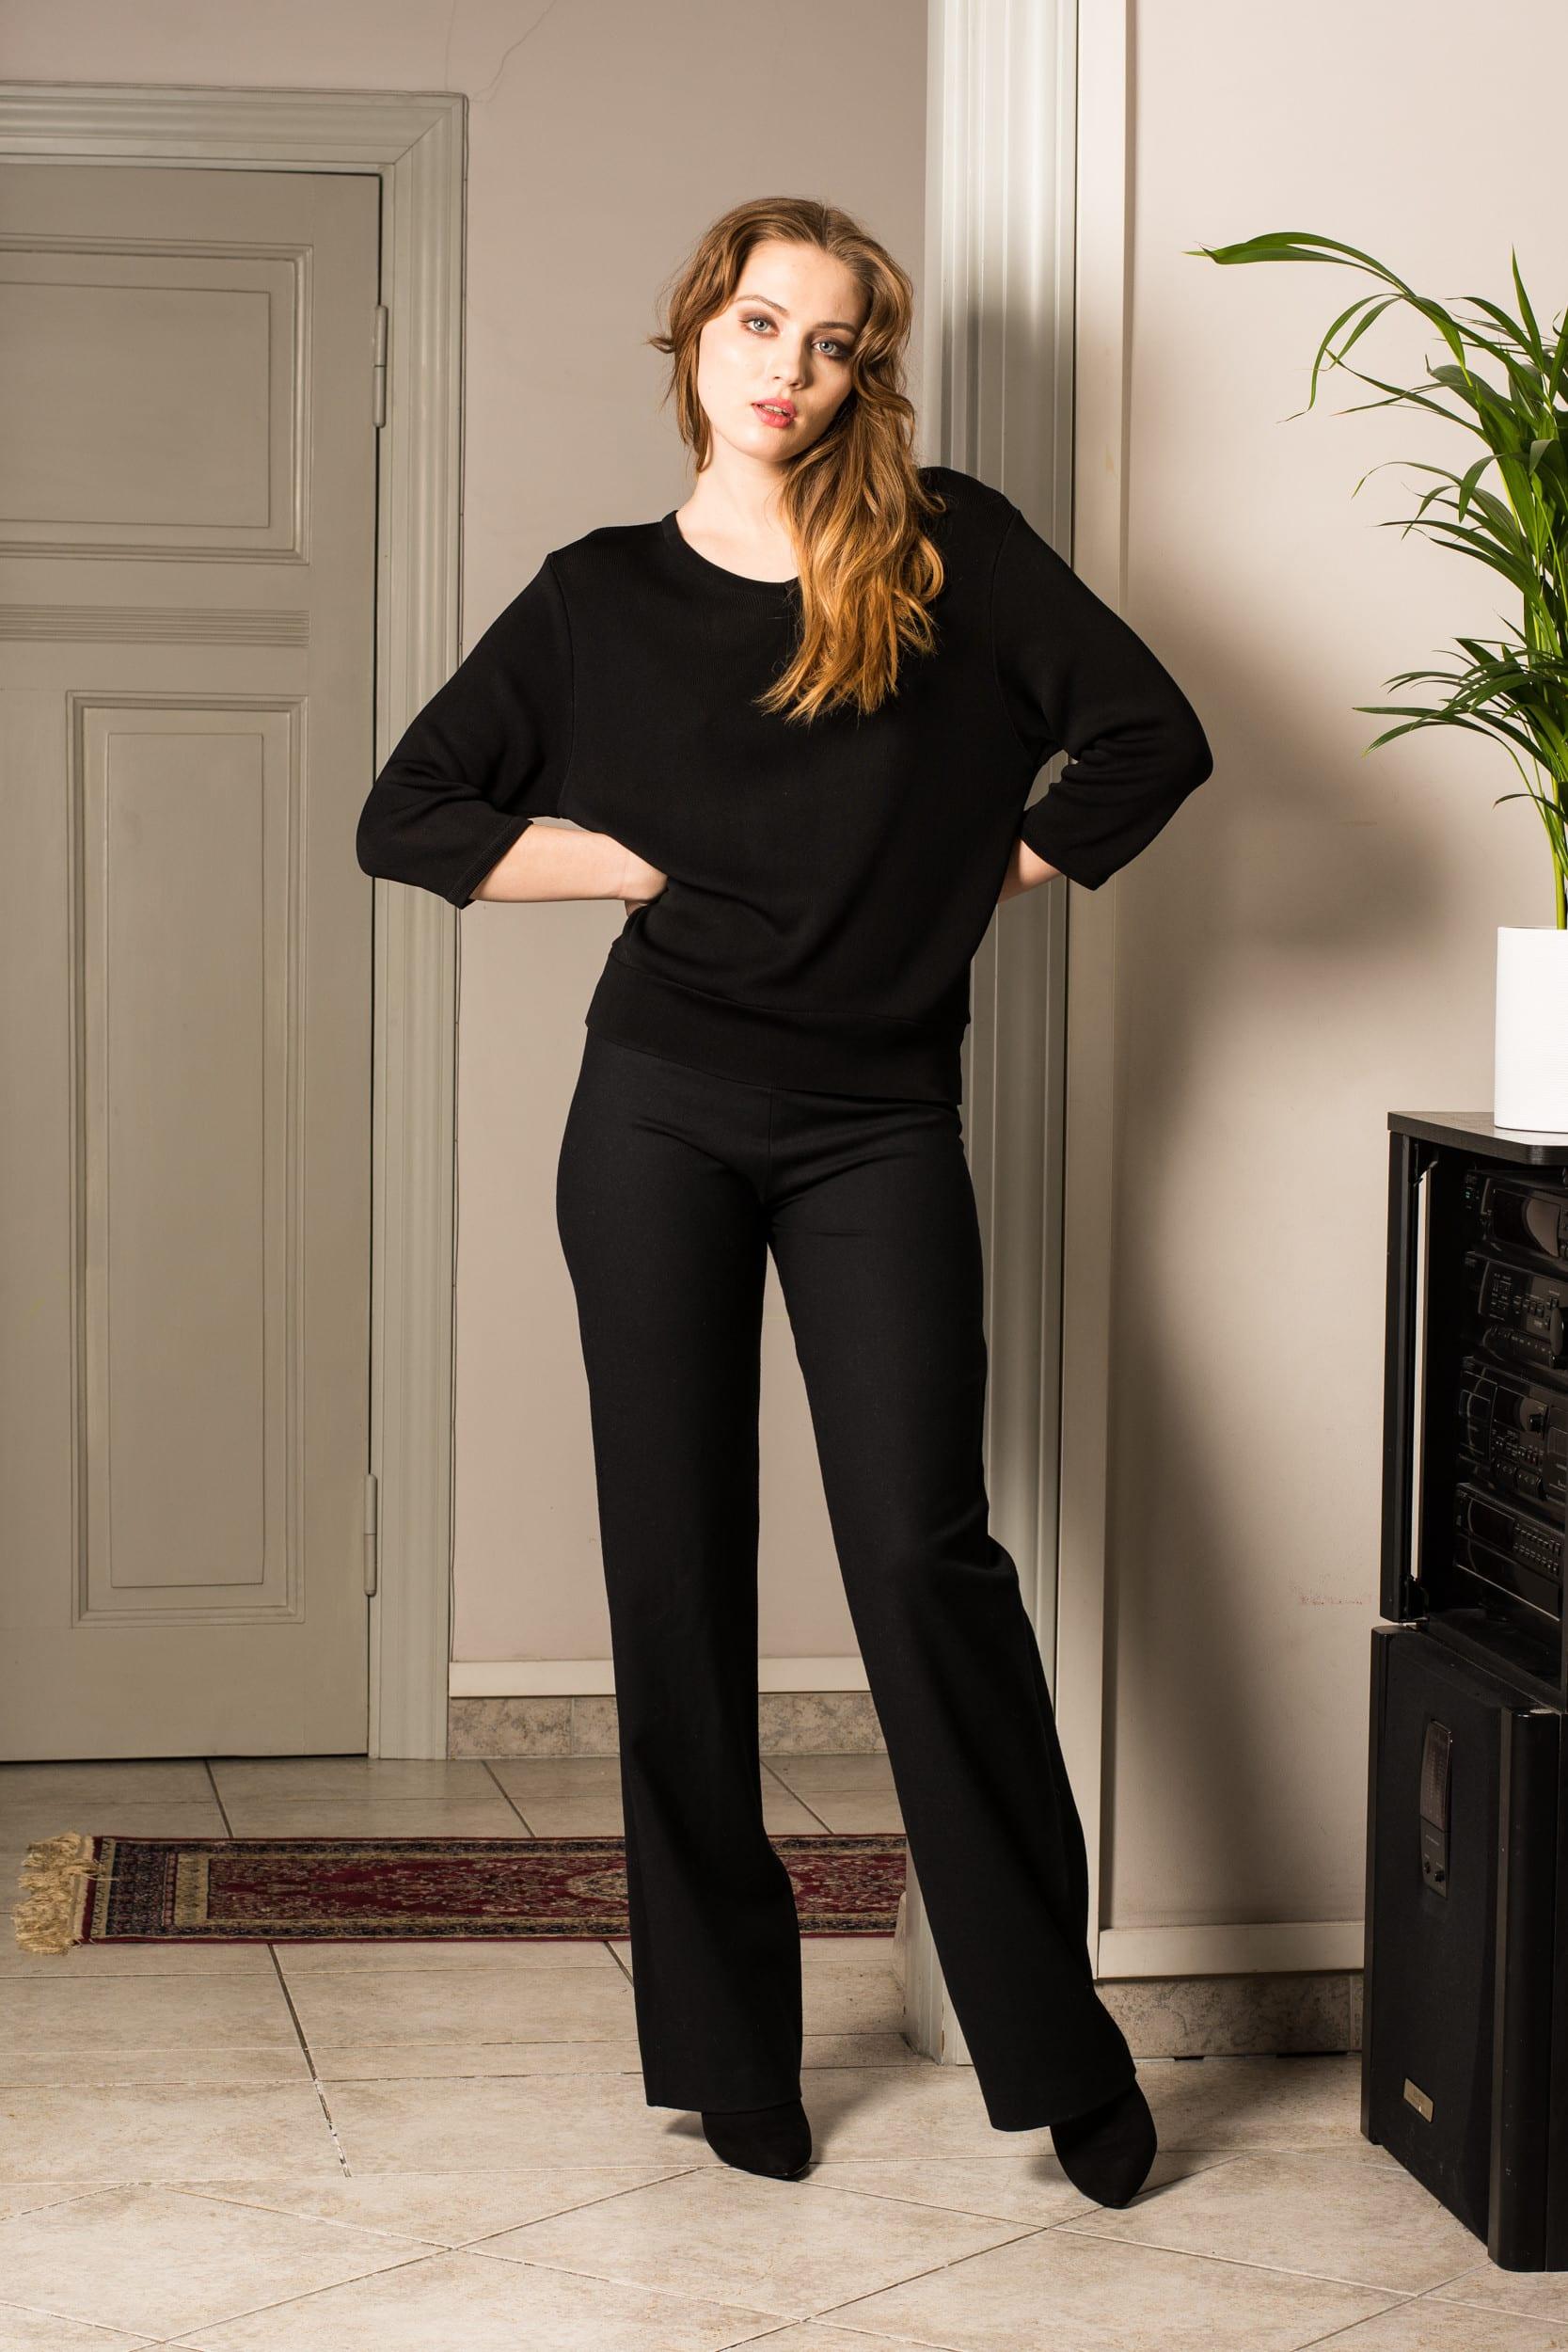 Schwarzer V-Ausschnitt 3/4 Ärmel Damen Frauen Pullover MIA